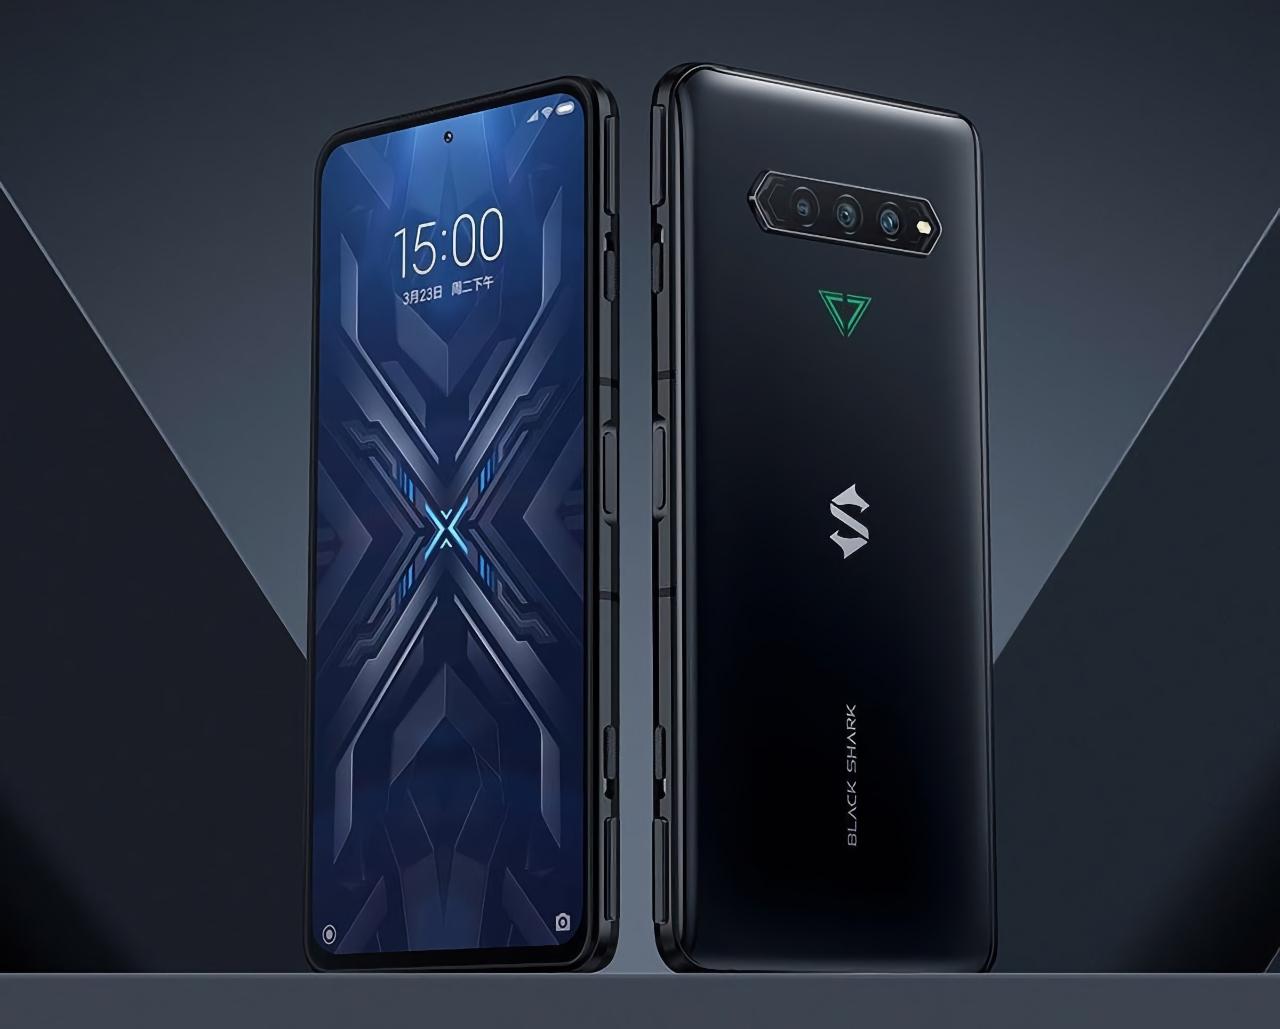 Xiaomi объявила дату презентации игровых смартфонов Black Shark 4S и Black Shark 4S Pro